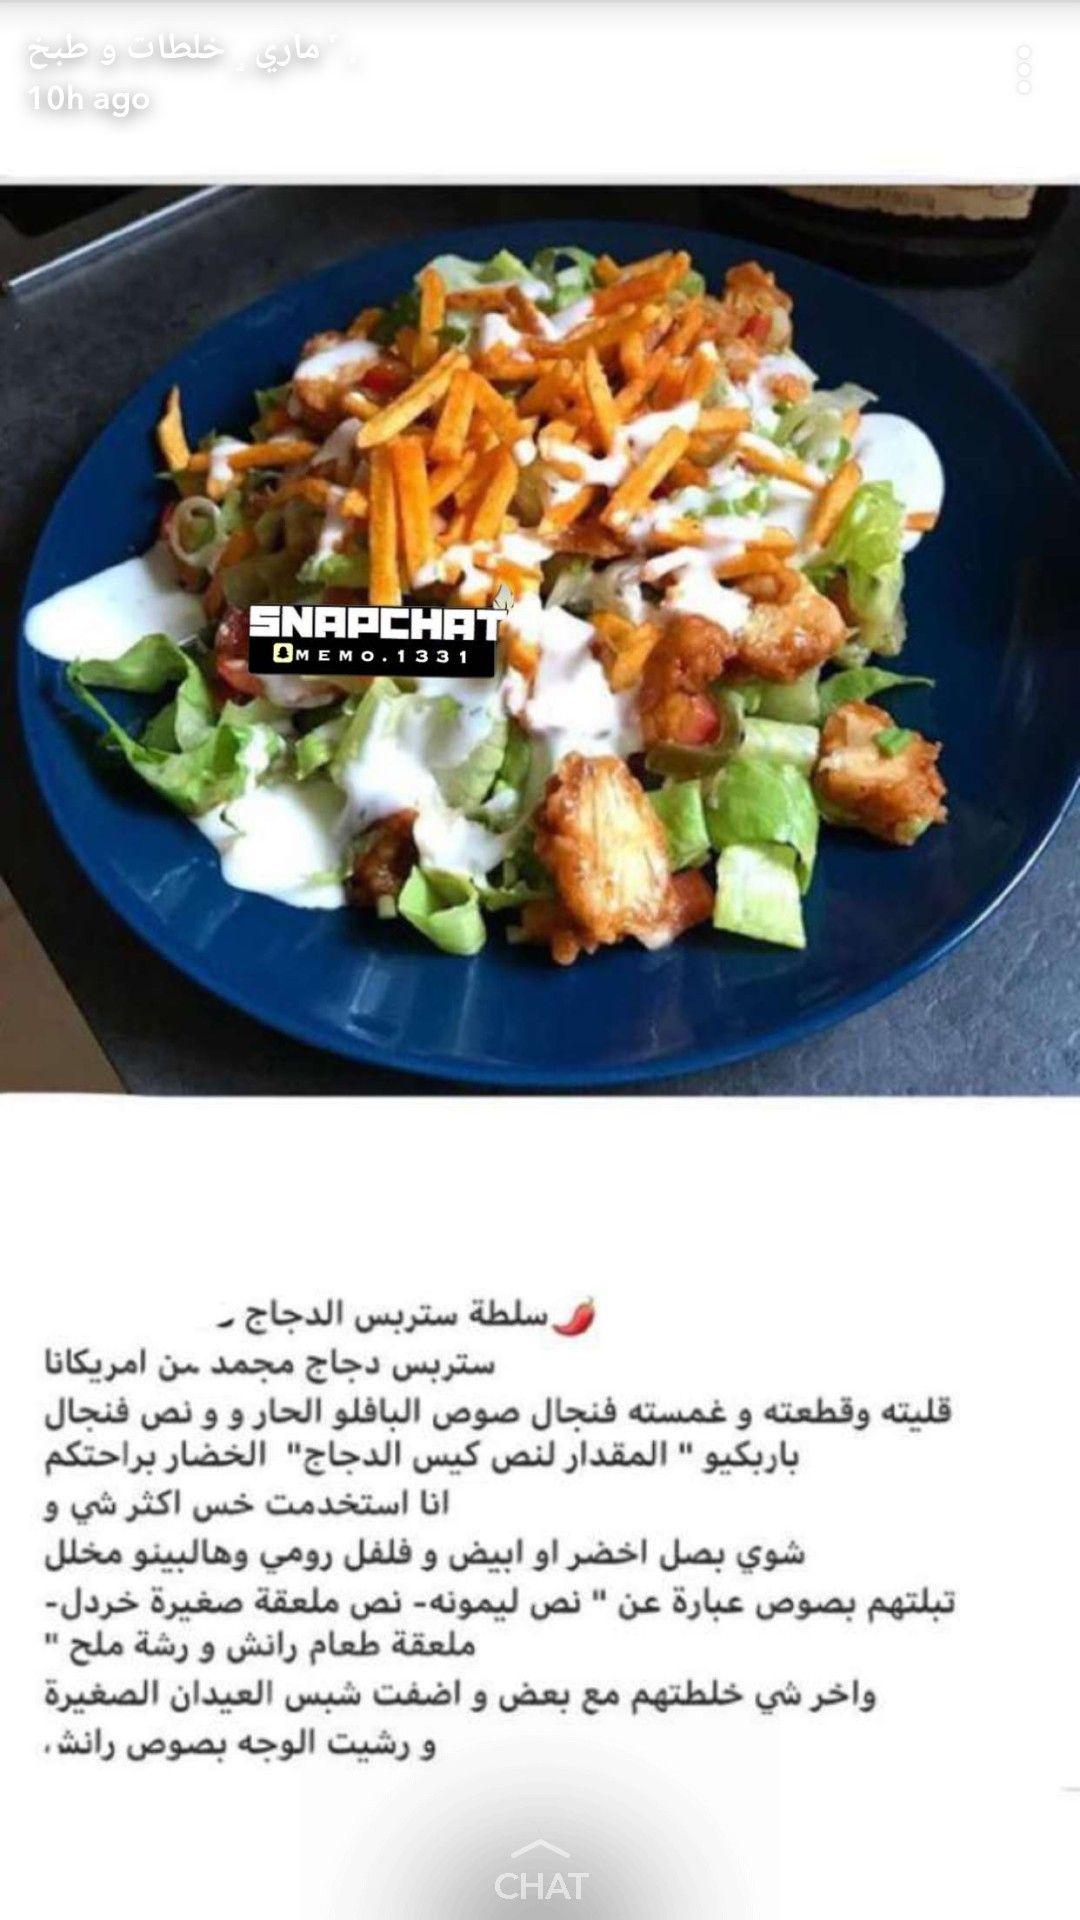 Pin By Bayan Mofeed On أكلاتي الزاكيات Cobb Salad Food Salad